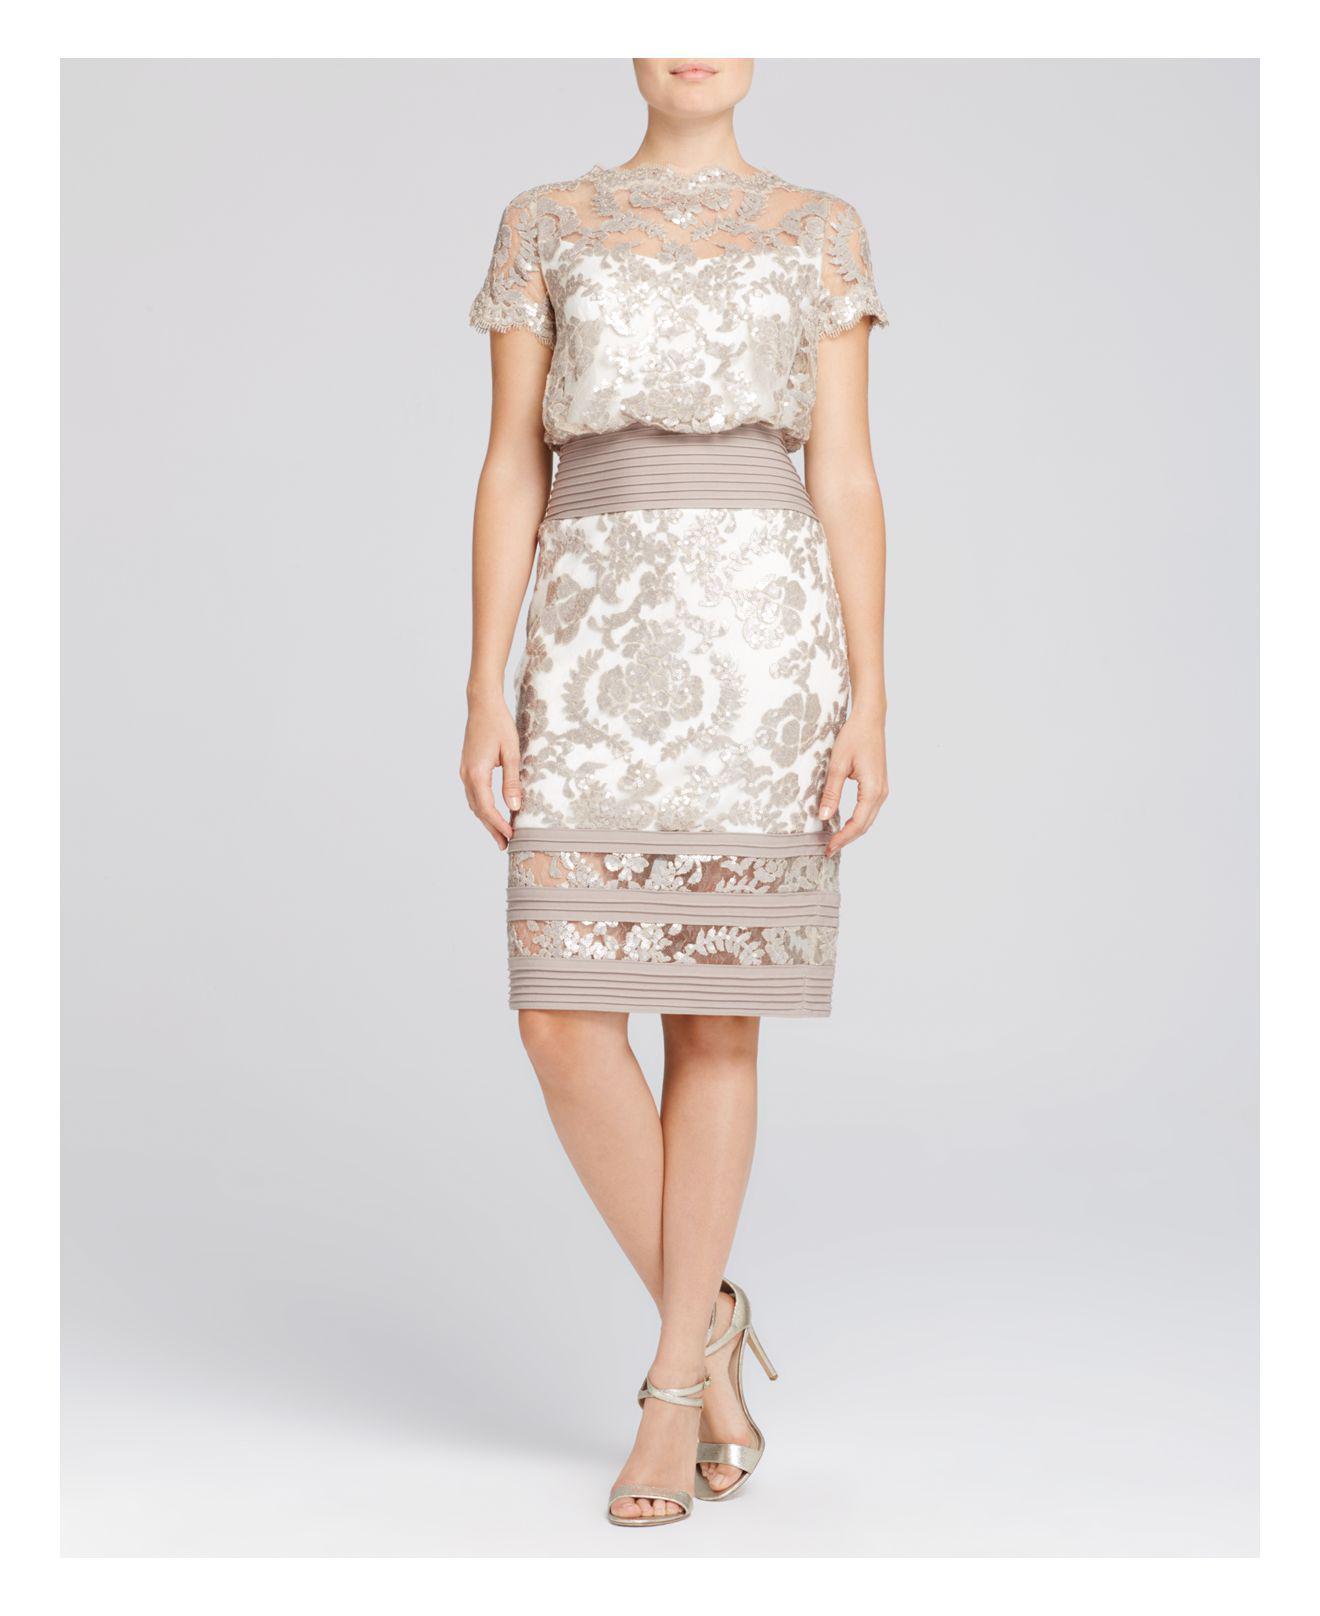 17810c926978 Lyst - Tadashi Shoji Petites Sequin Blouson Dress in White